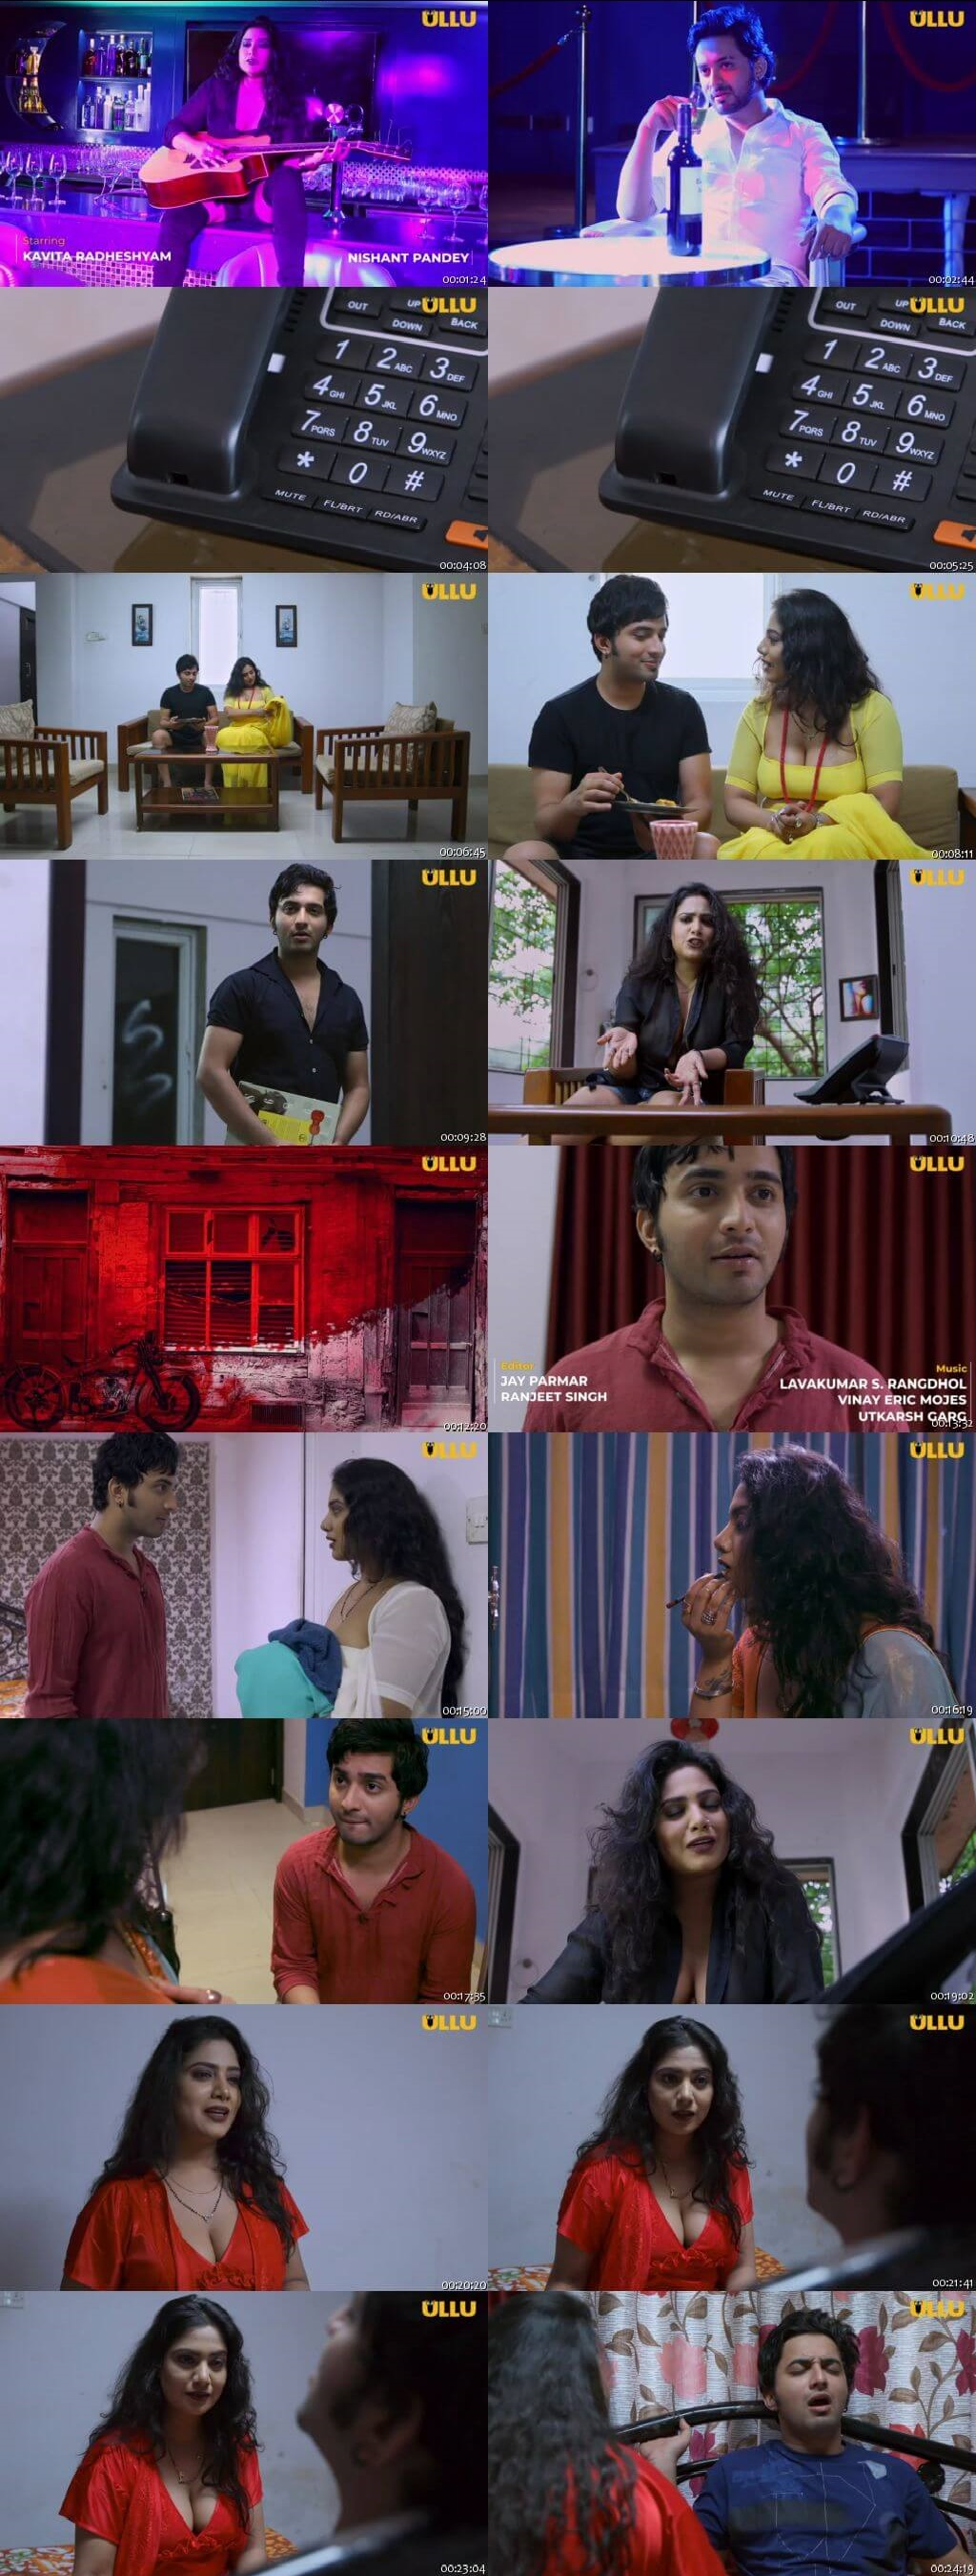 Screenshots Of Hindi Show Kavita Bhabhi Season 02 2020 Complete - All Episodes 300MB 720P HD